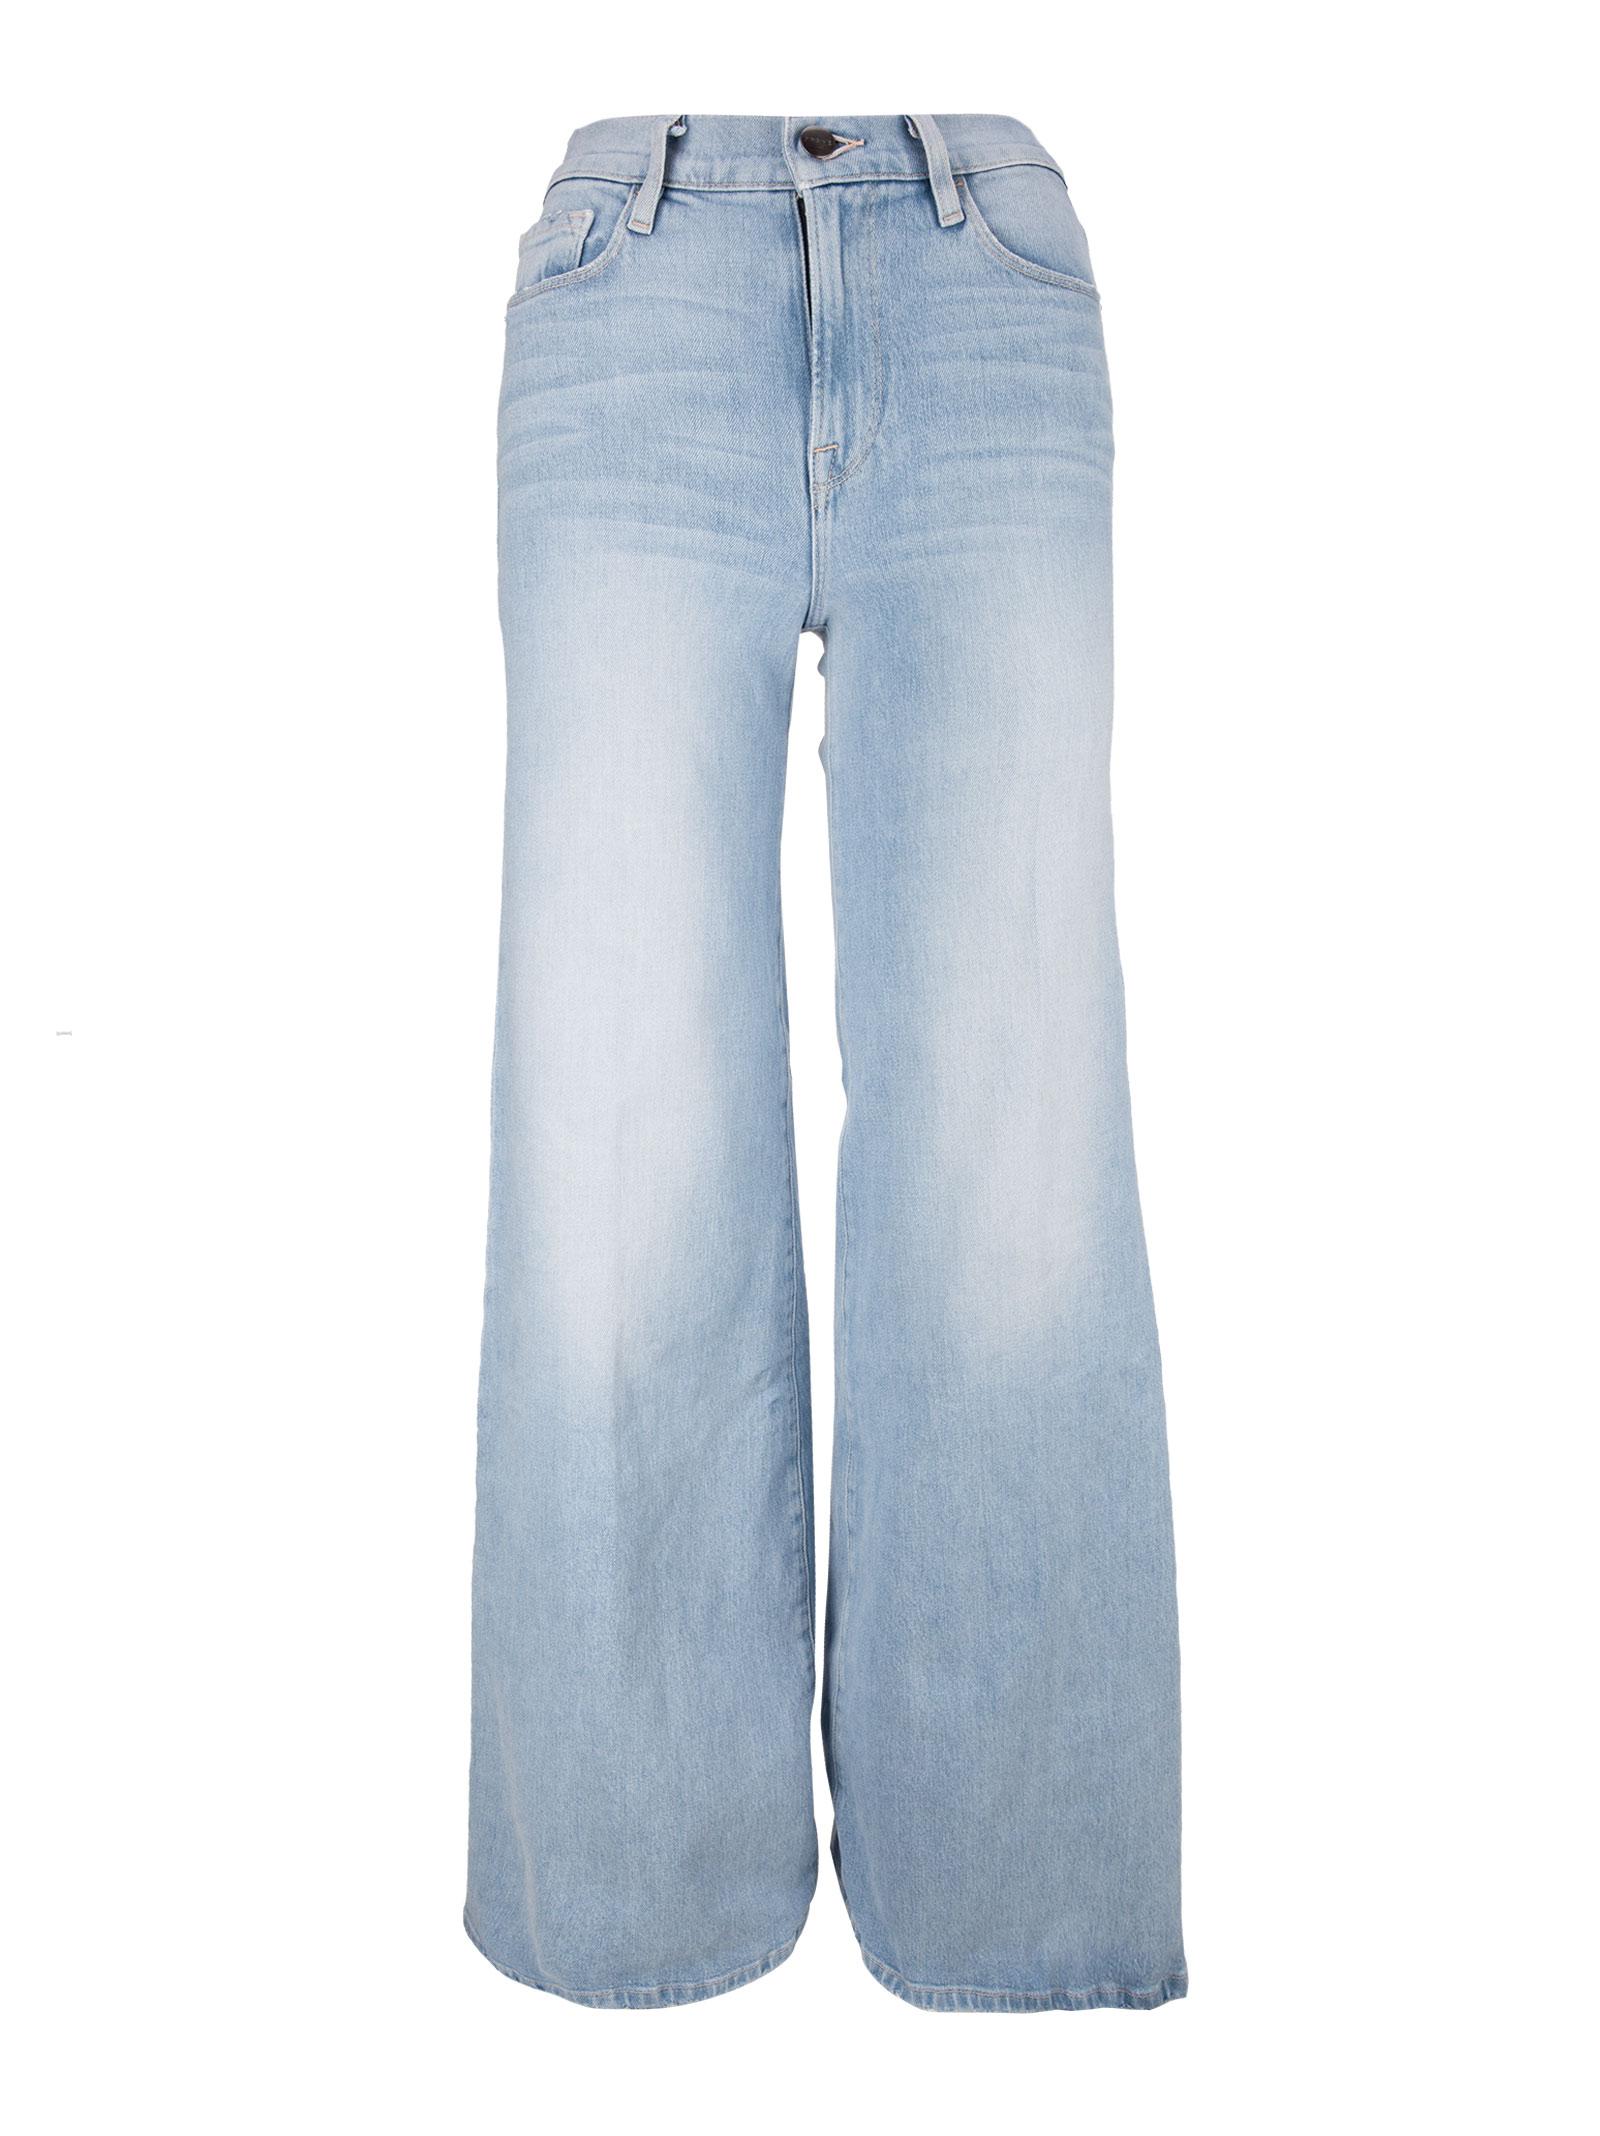 Frame Denim jeans - Frame denim - Michele Franzese Moda